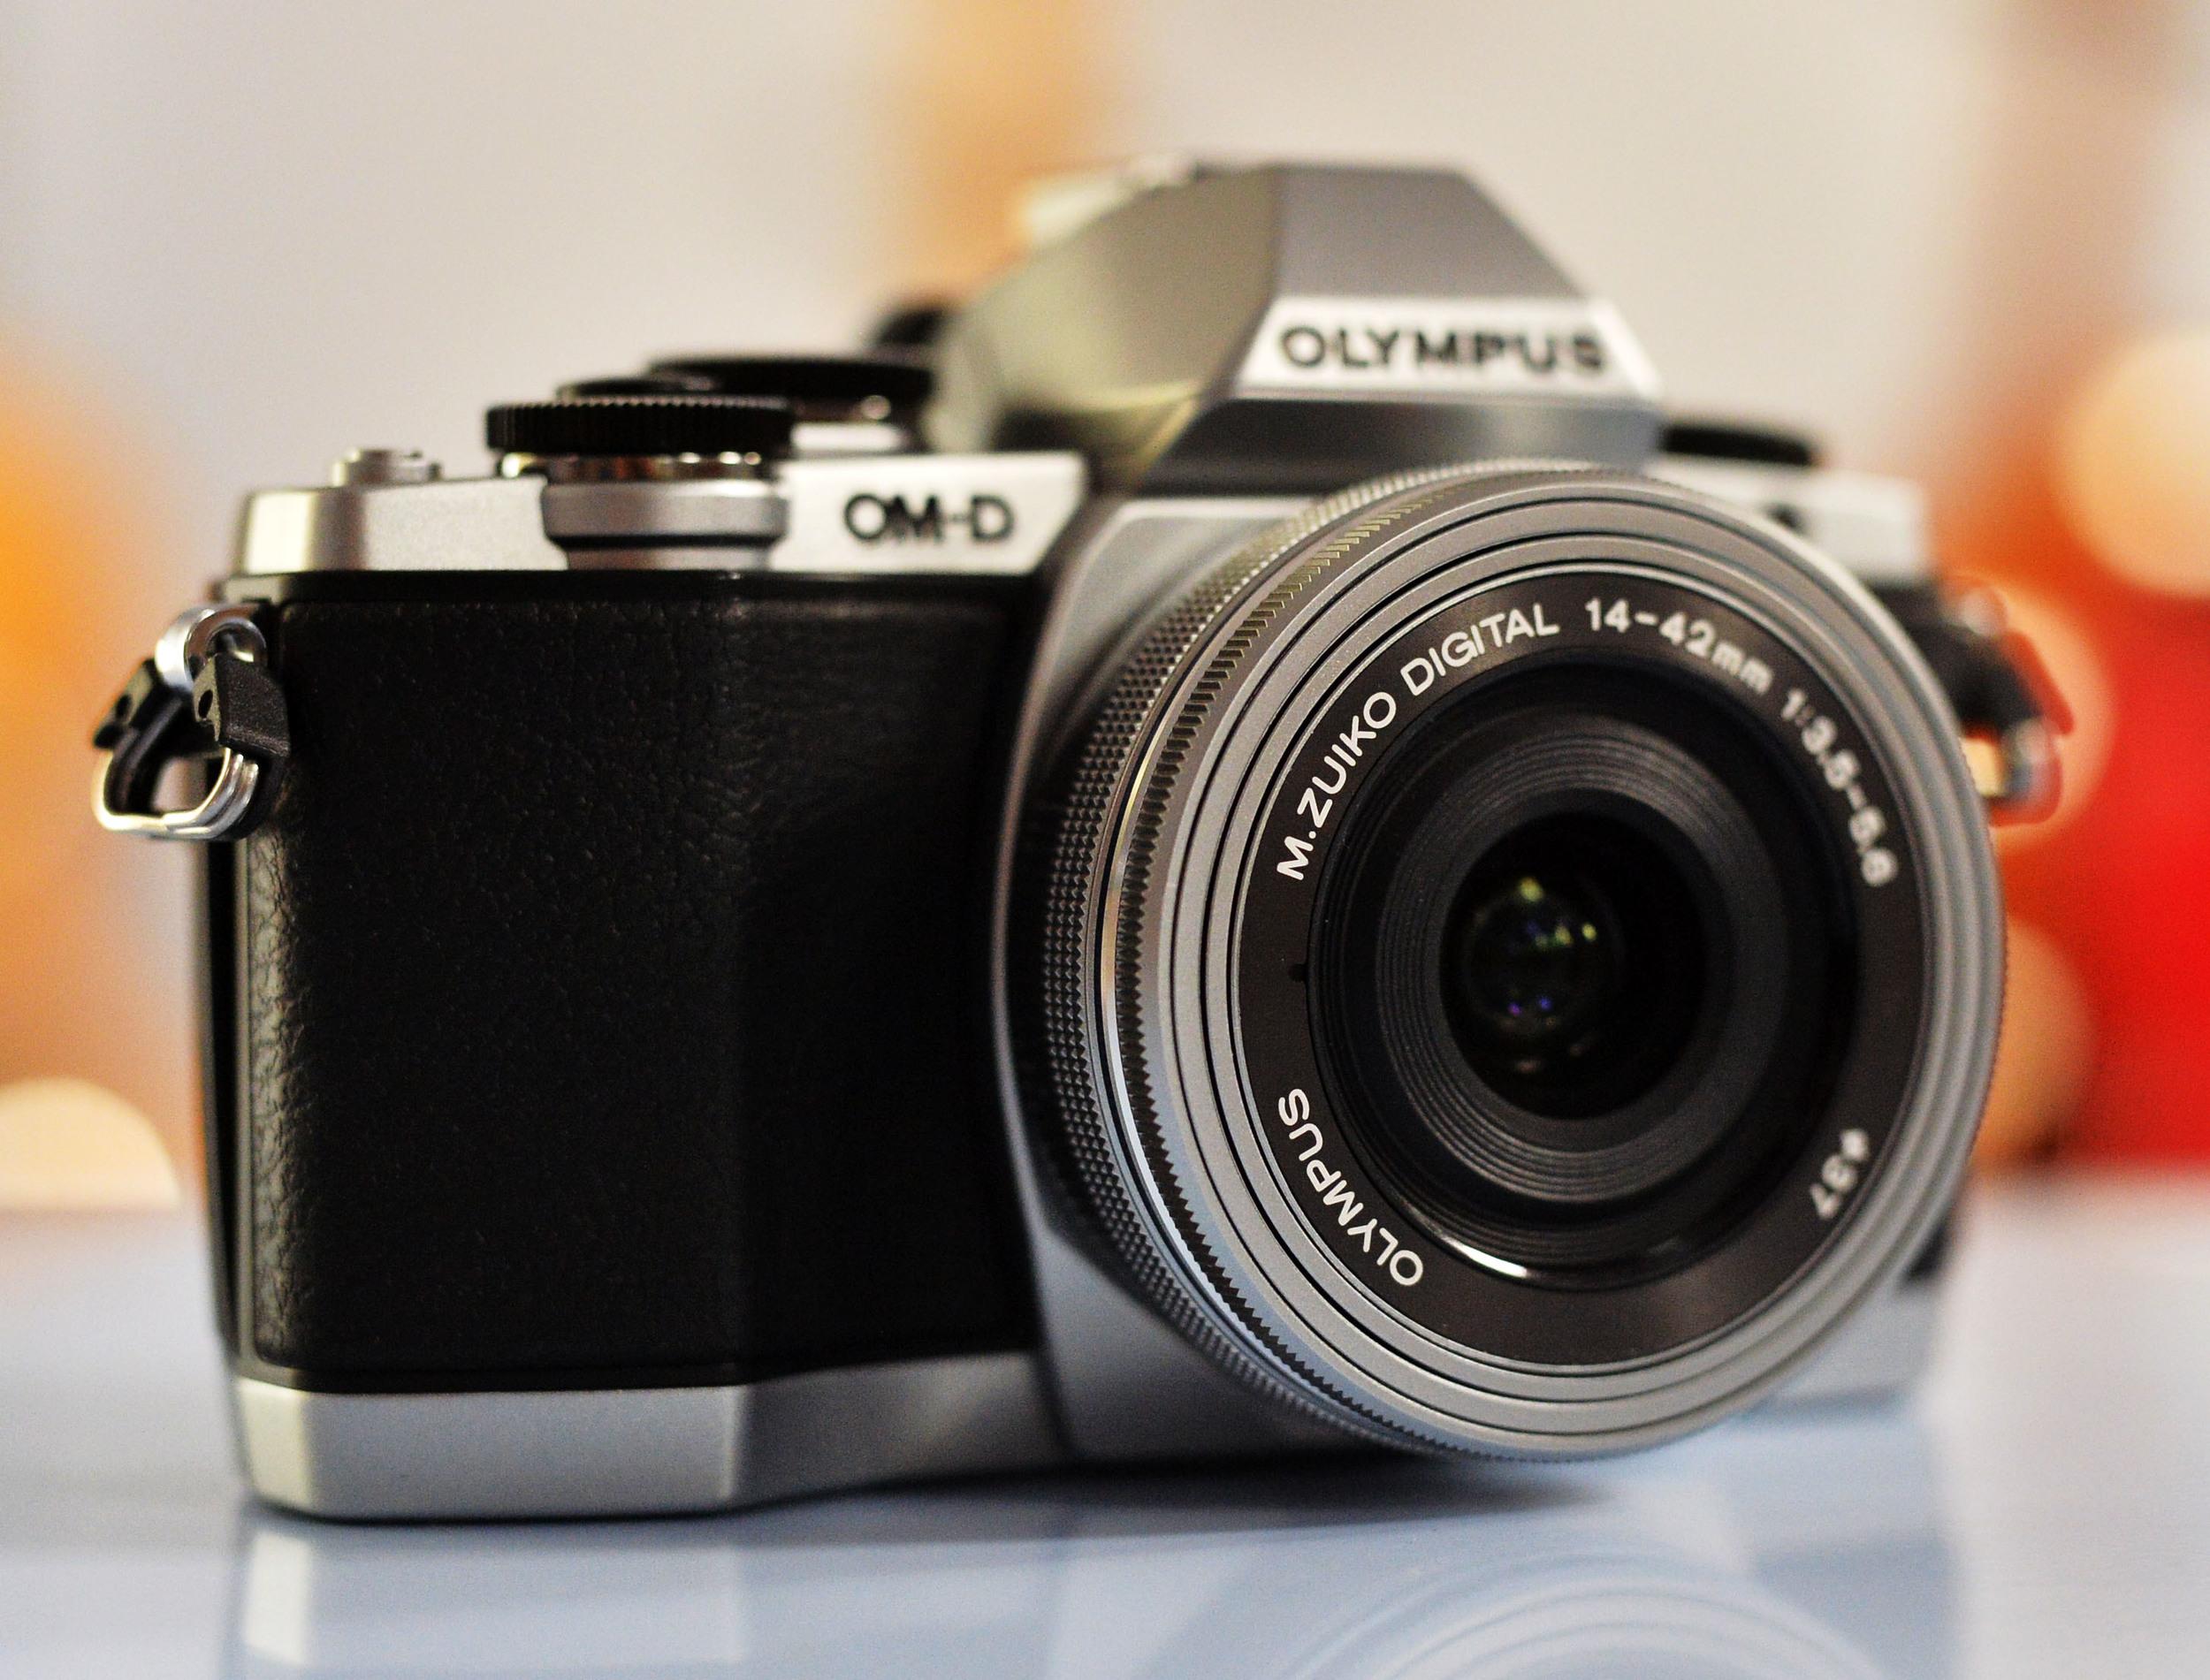 Olympus OM-D E-M10 M.ZUIKO 14-42mm